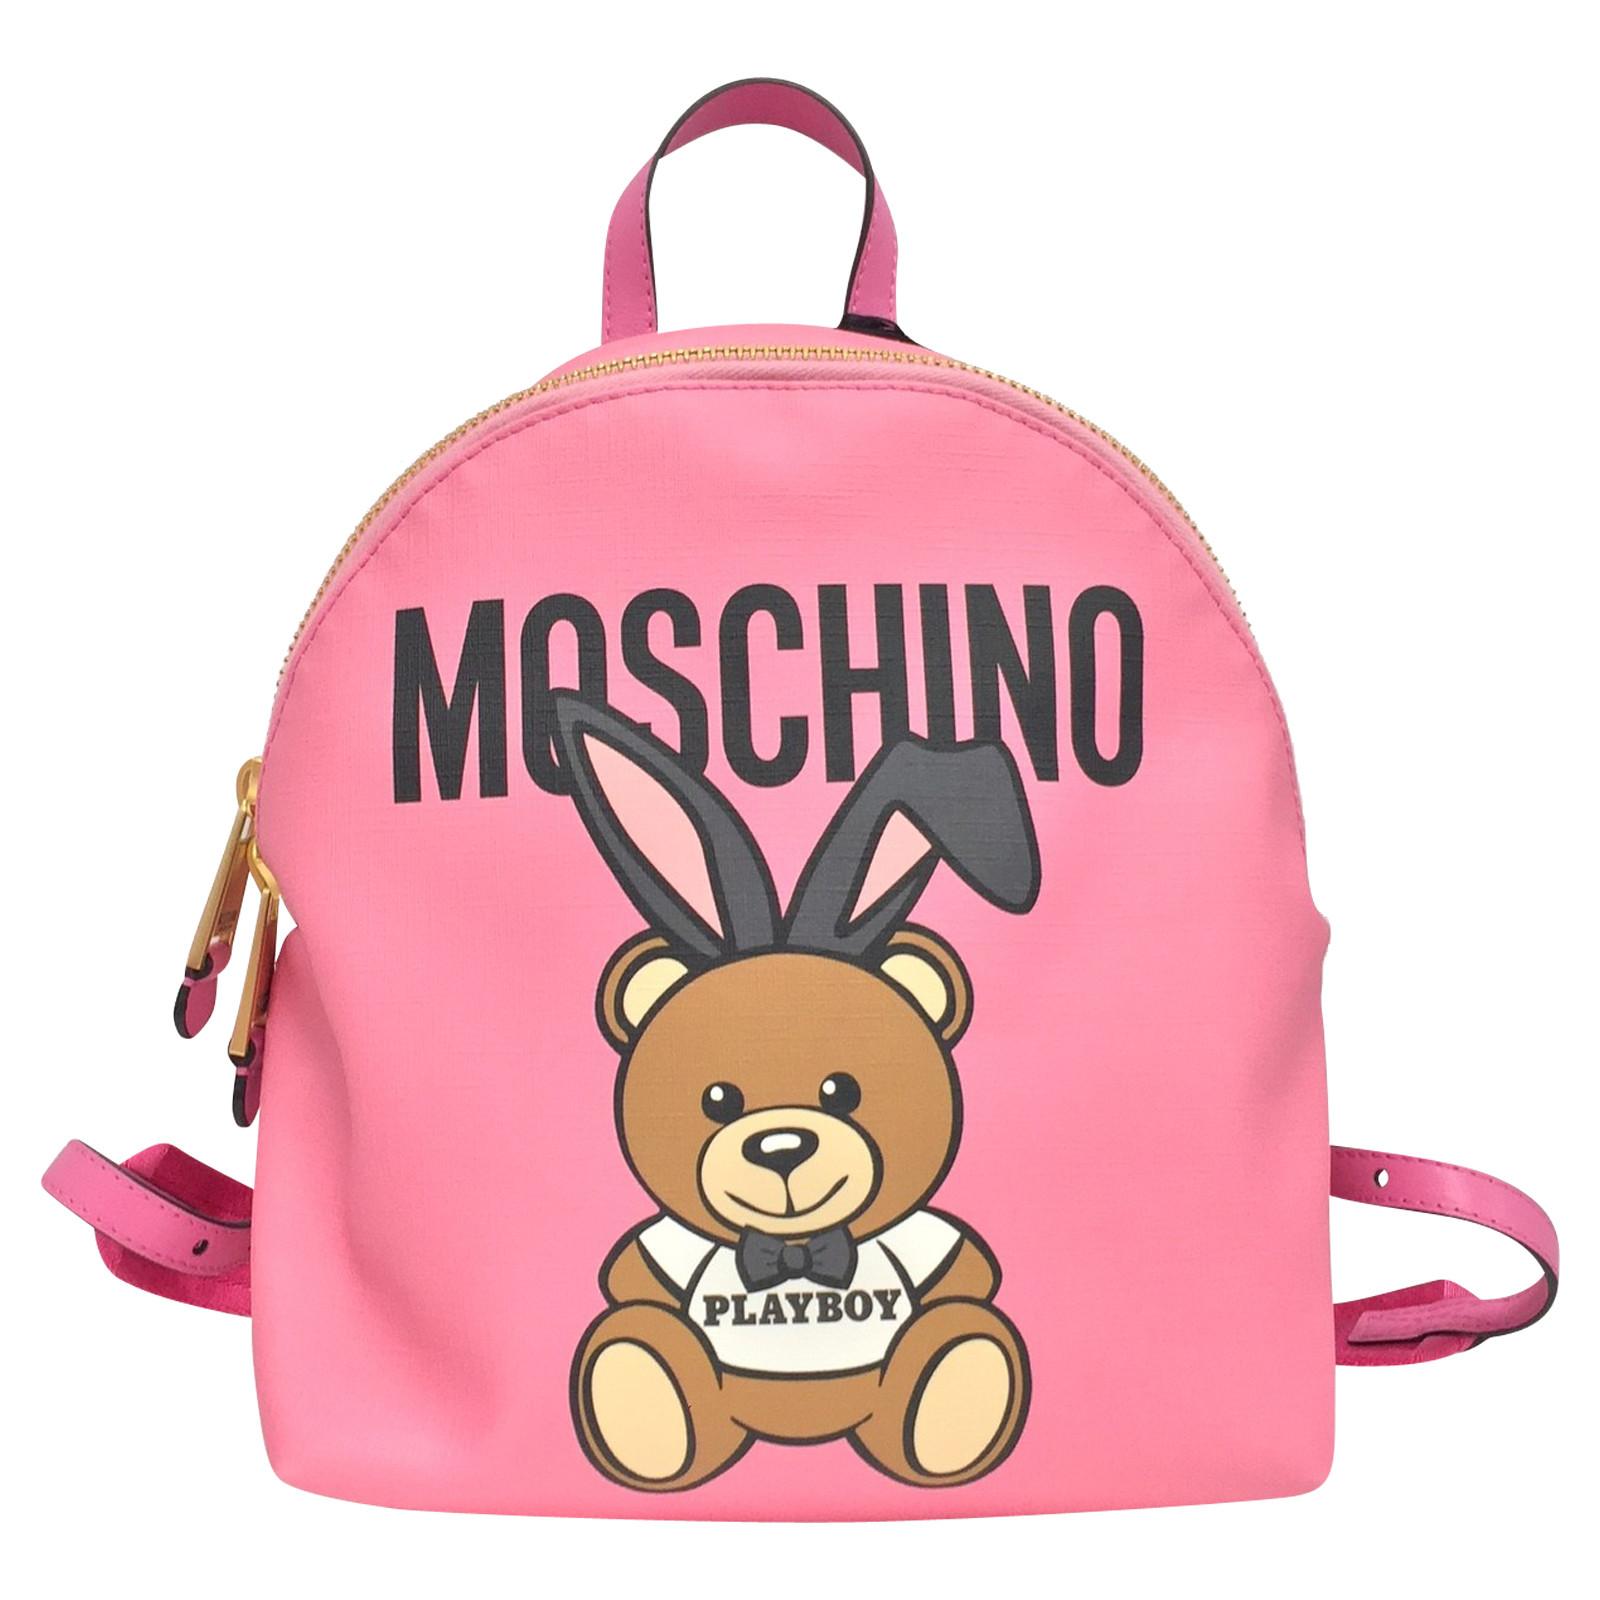 Moschino Zaino di seconda mano: shop online di Moschino